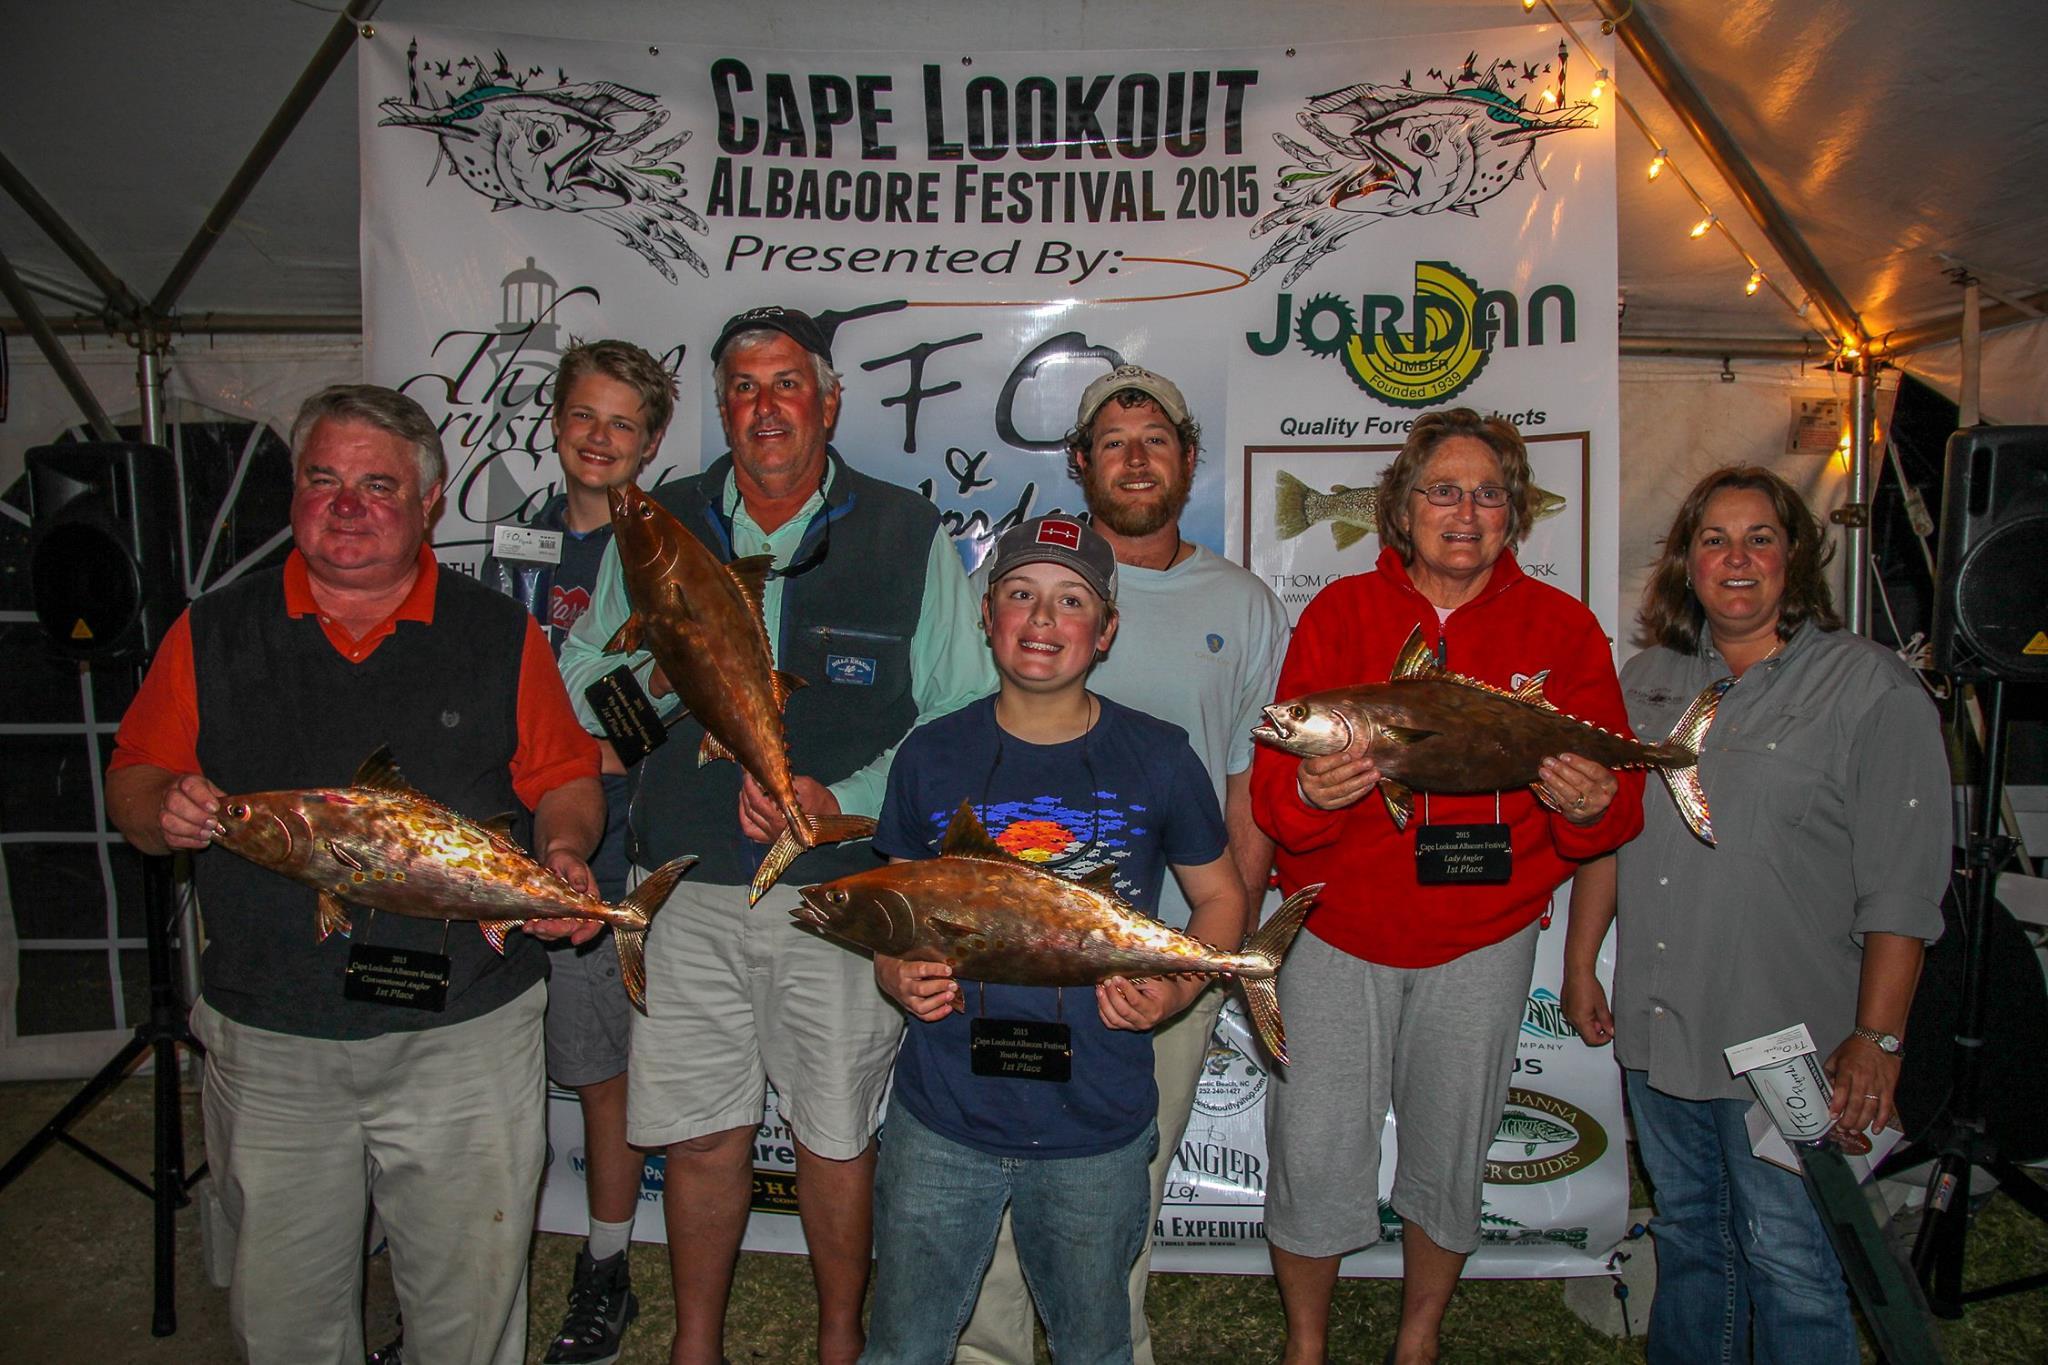 The 2016 Cape Lookout Albacore Festival Announced!